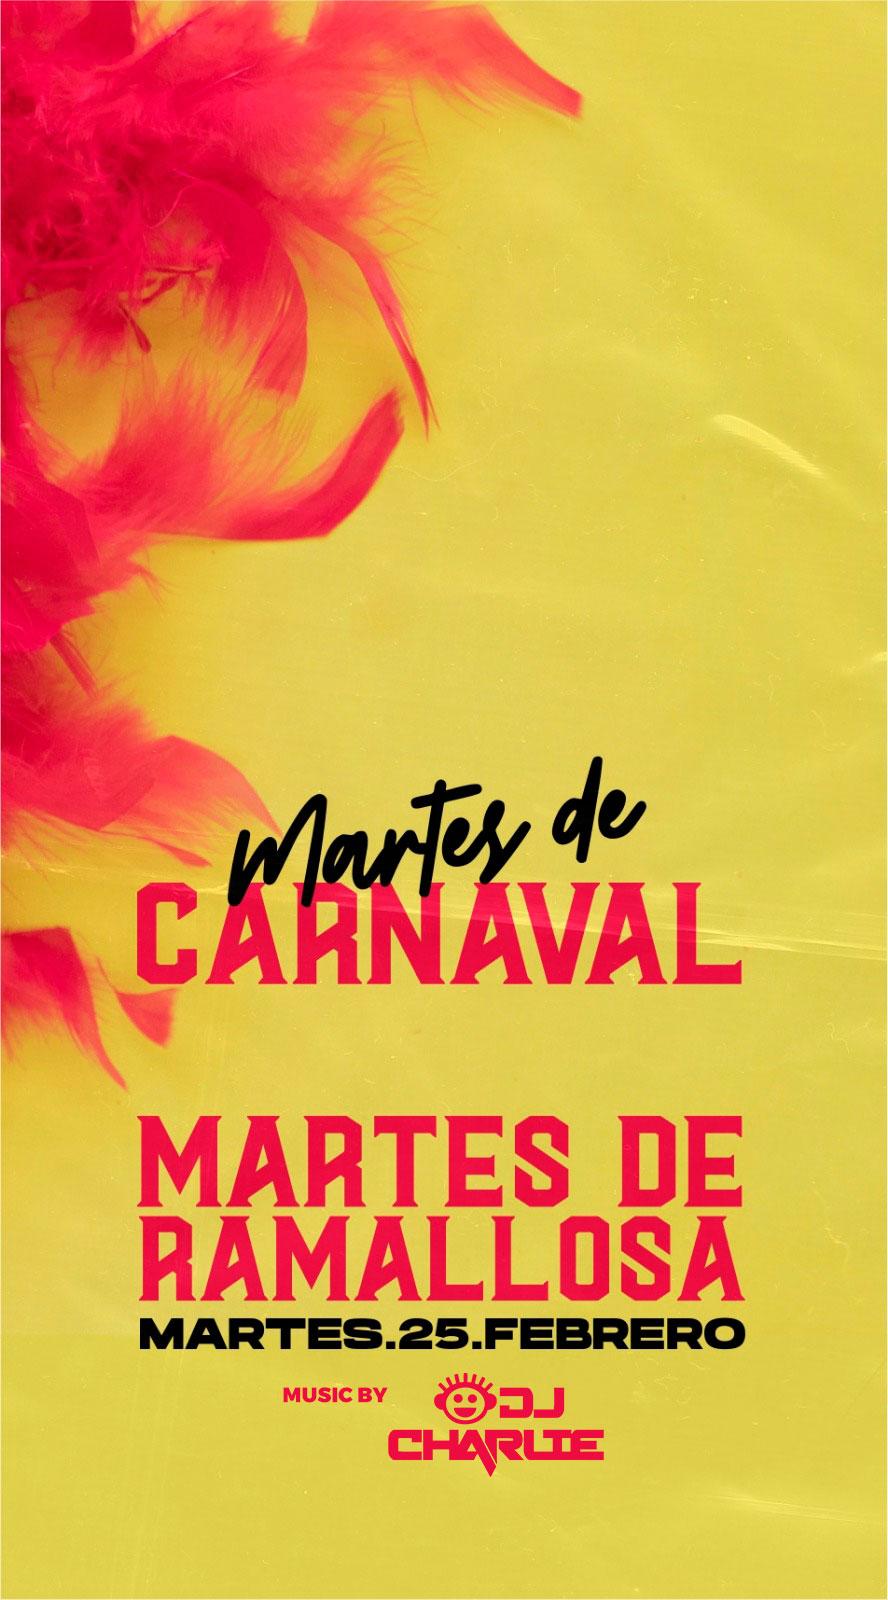 25-02-2020-Ramallosa-2000-Carnaval